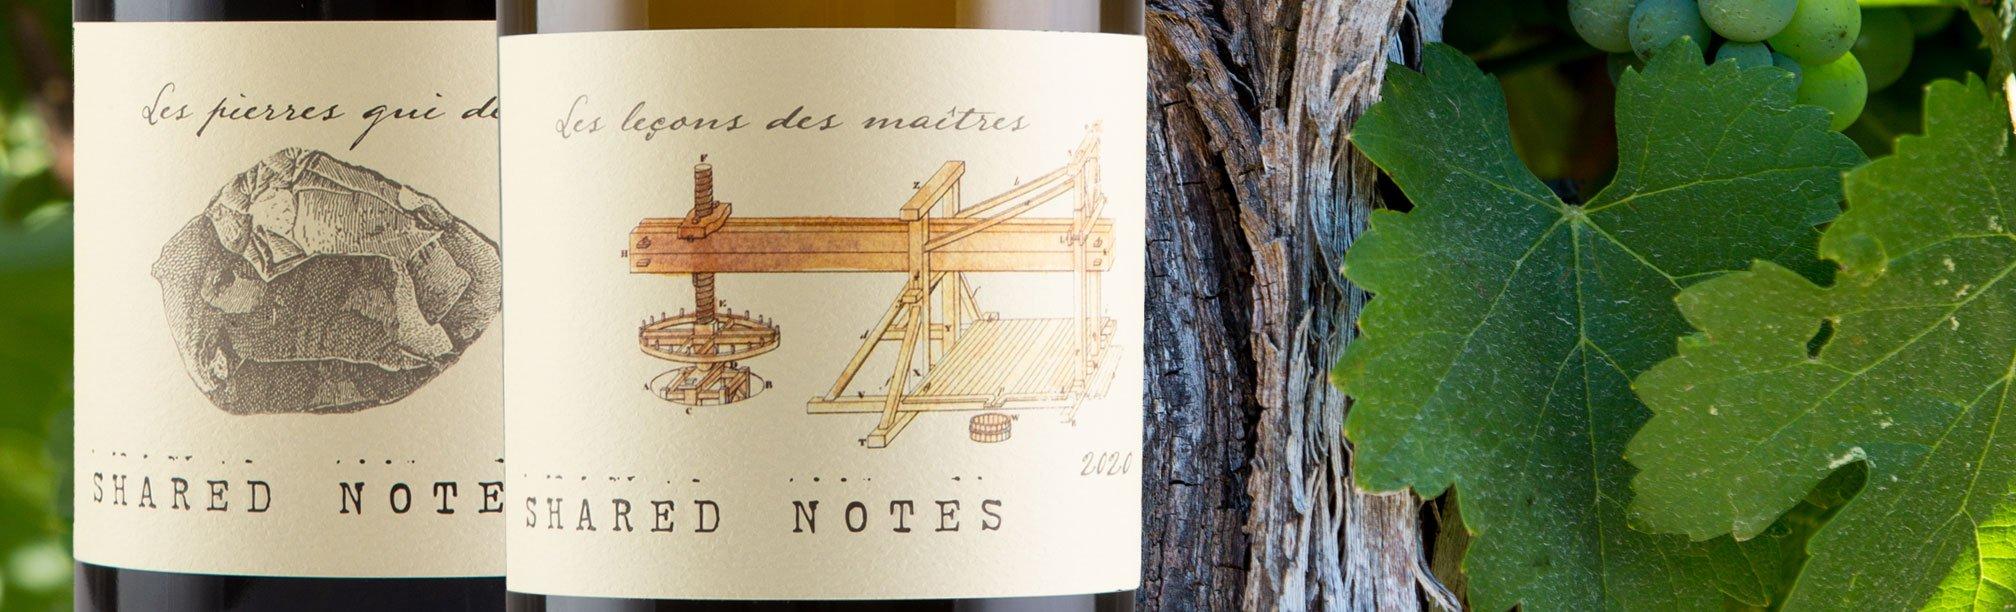 Sauvignon Blanc Vineyard Rows